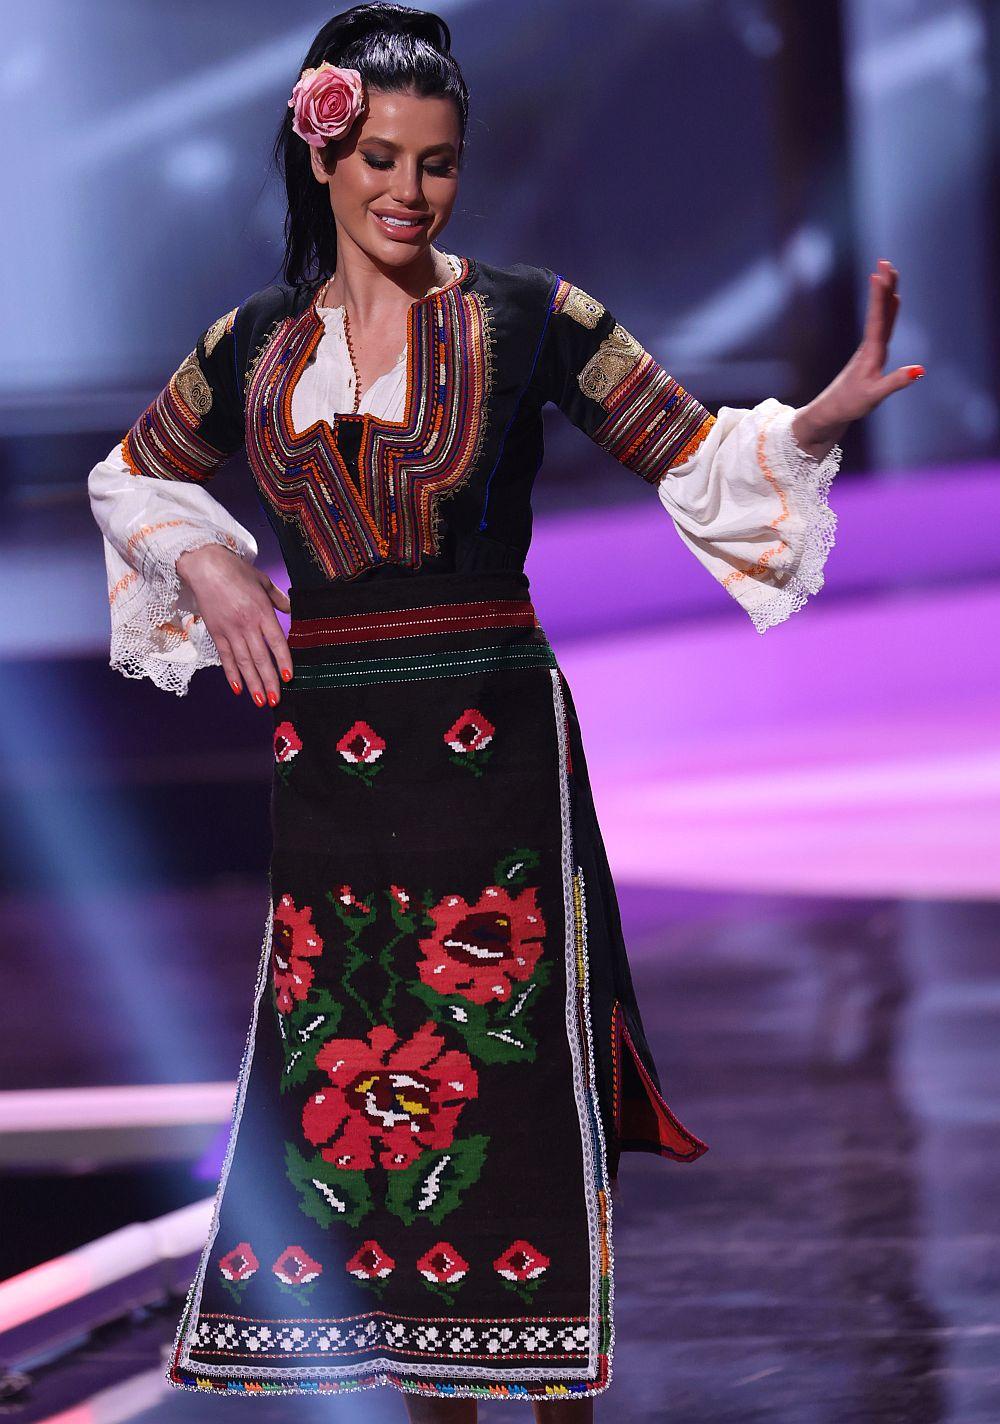 Мис България Радинела Чушева